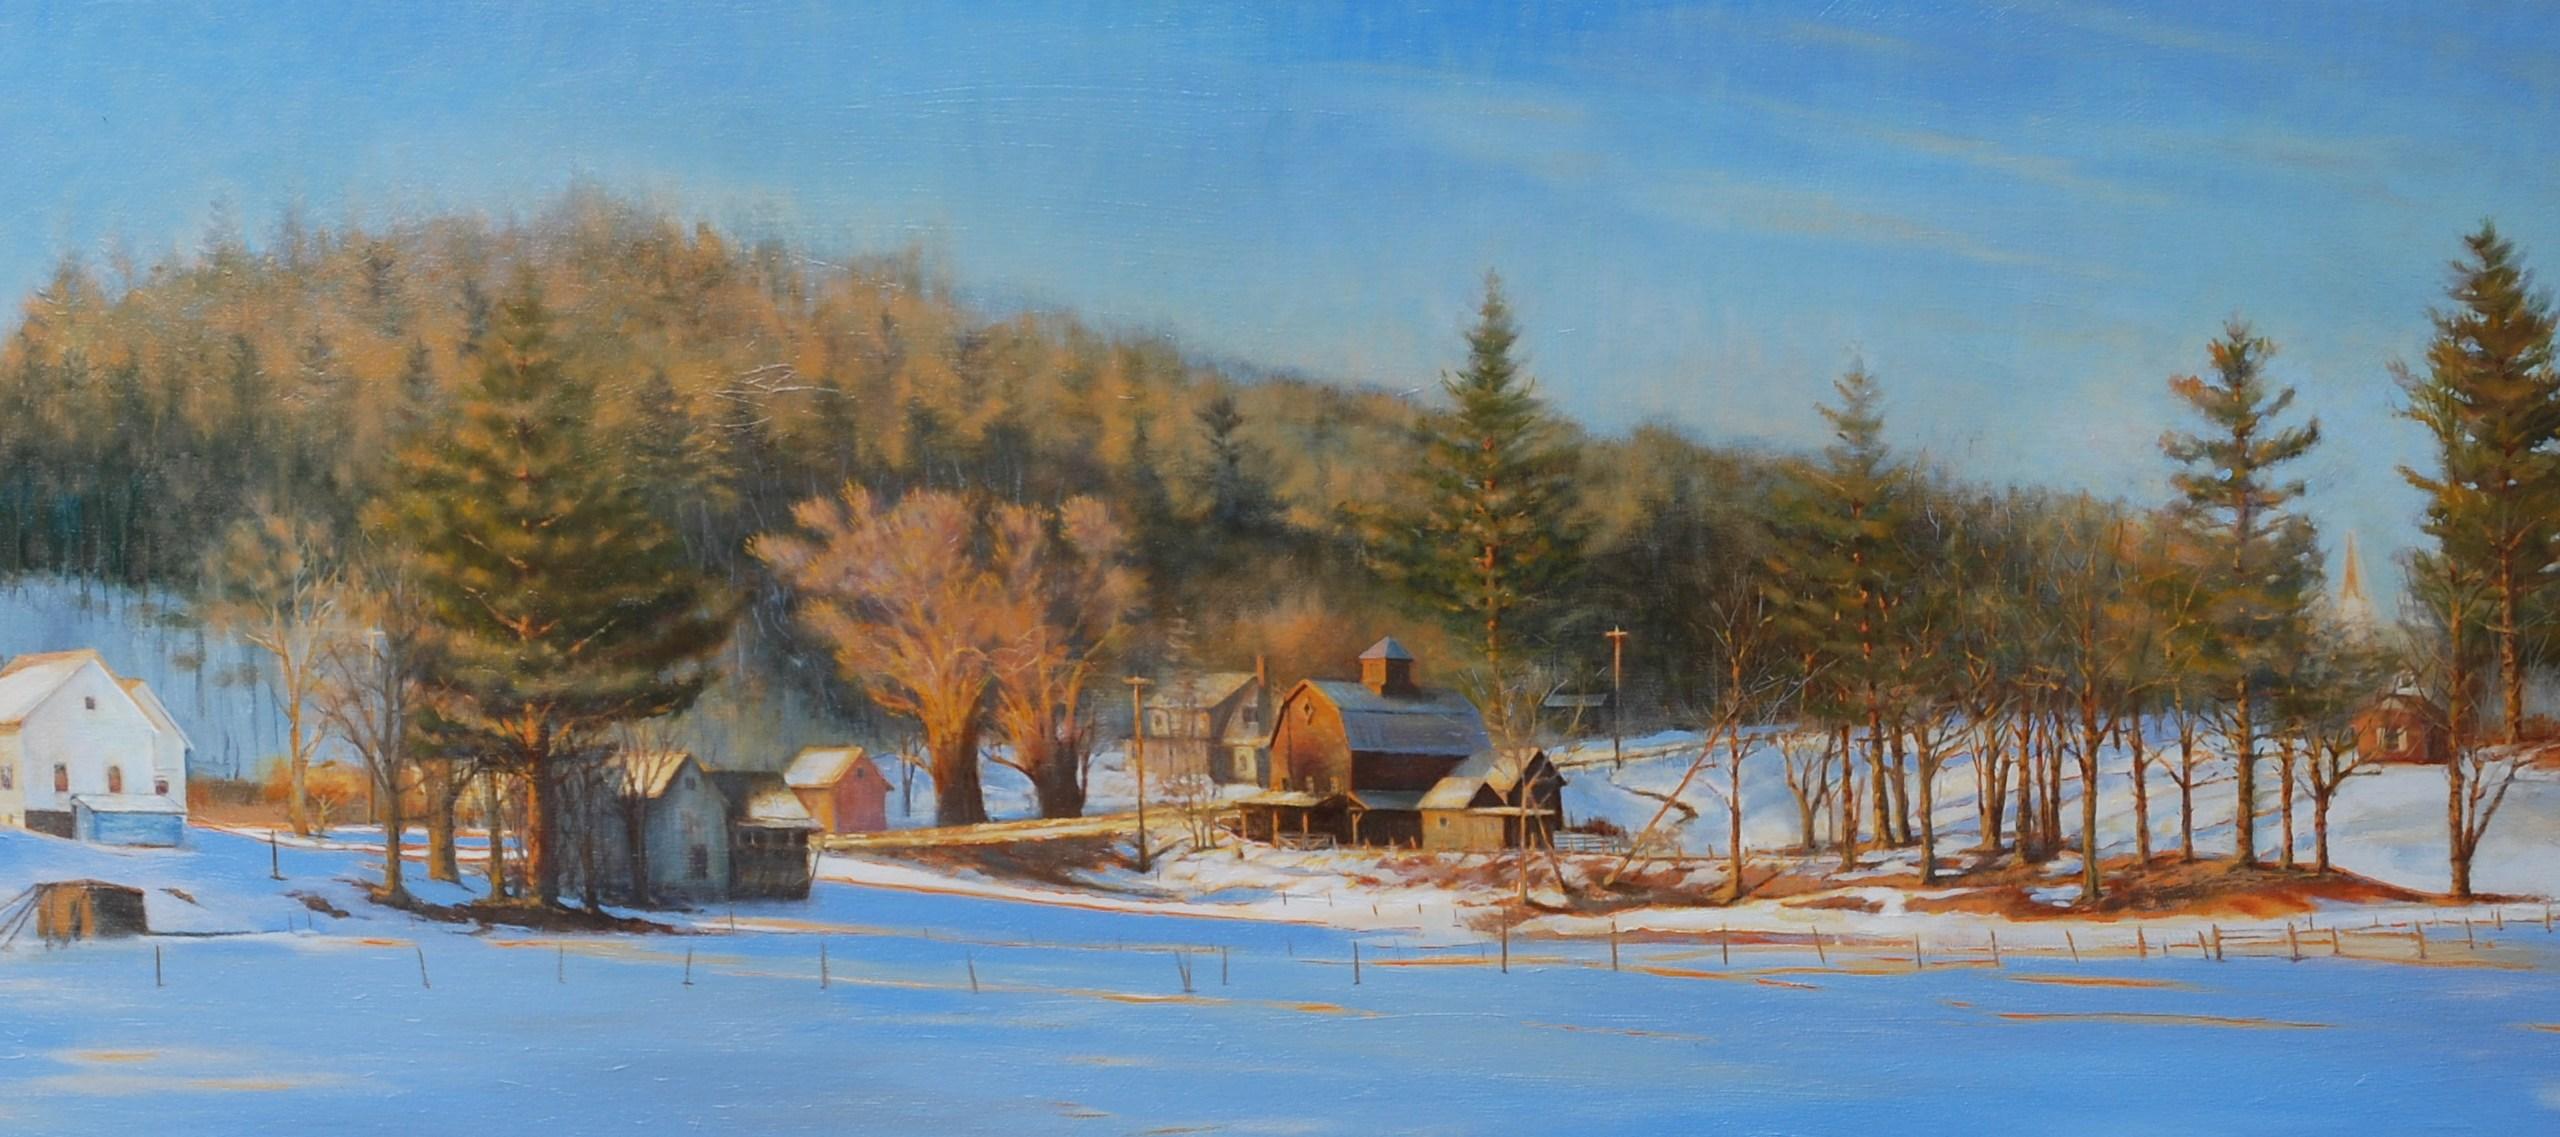 Fahey- Winter Afternoon ,Worcester, Vermont 24x66in oil_1548707196446.JPG.jpg